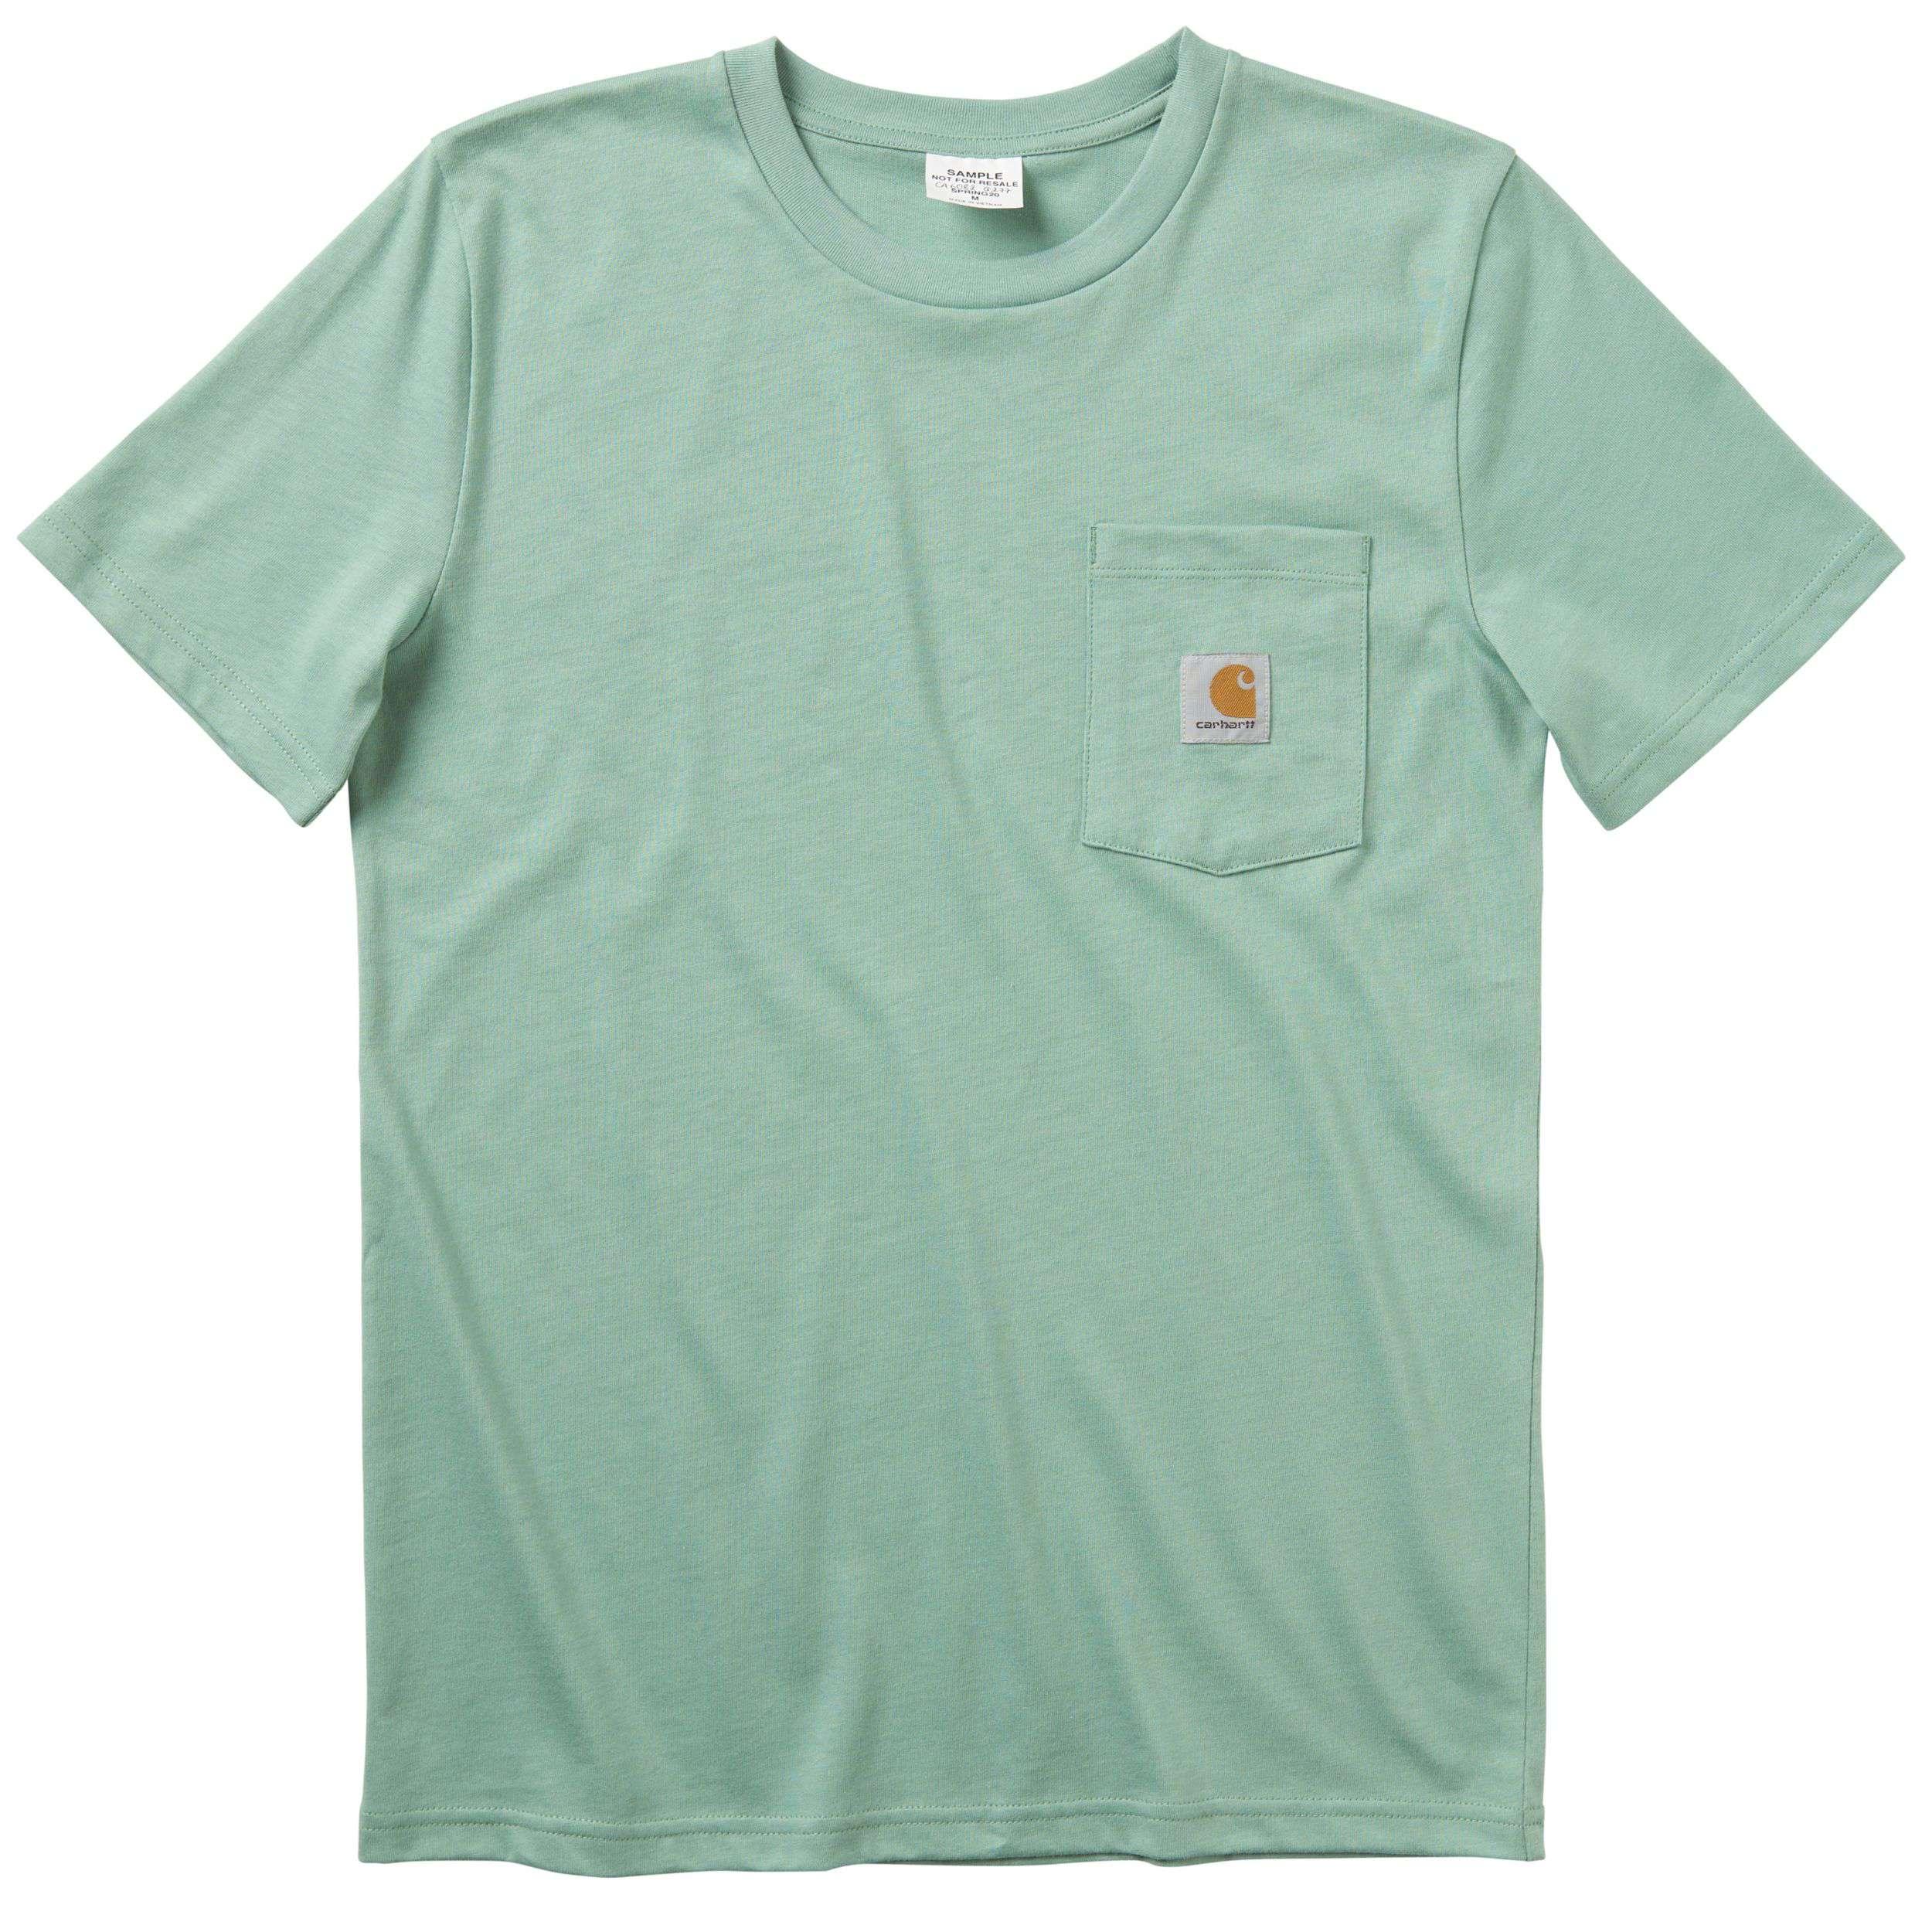 Carhartt Short-Sleeve Graphic Pocket Tee